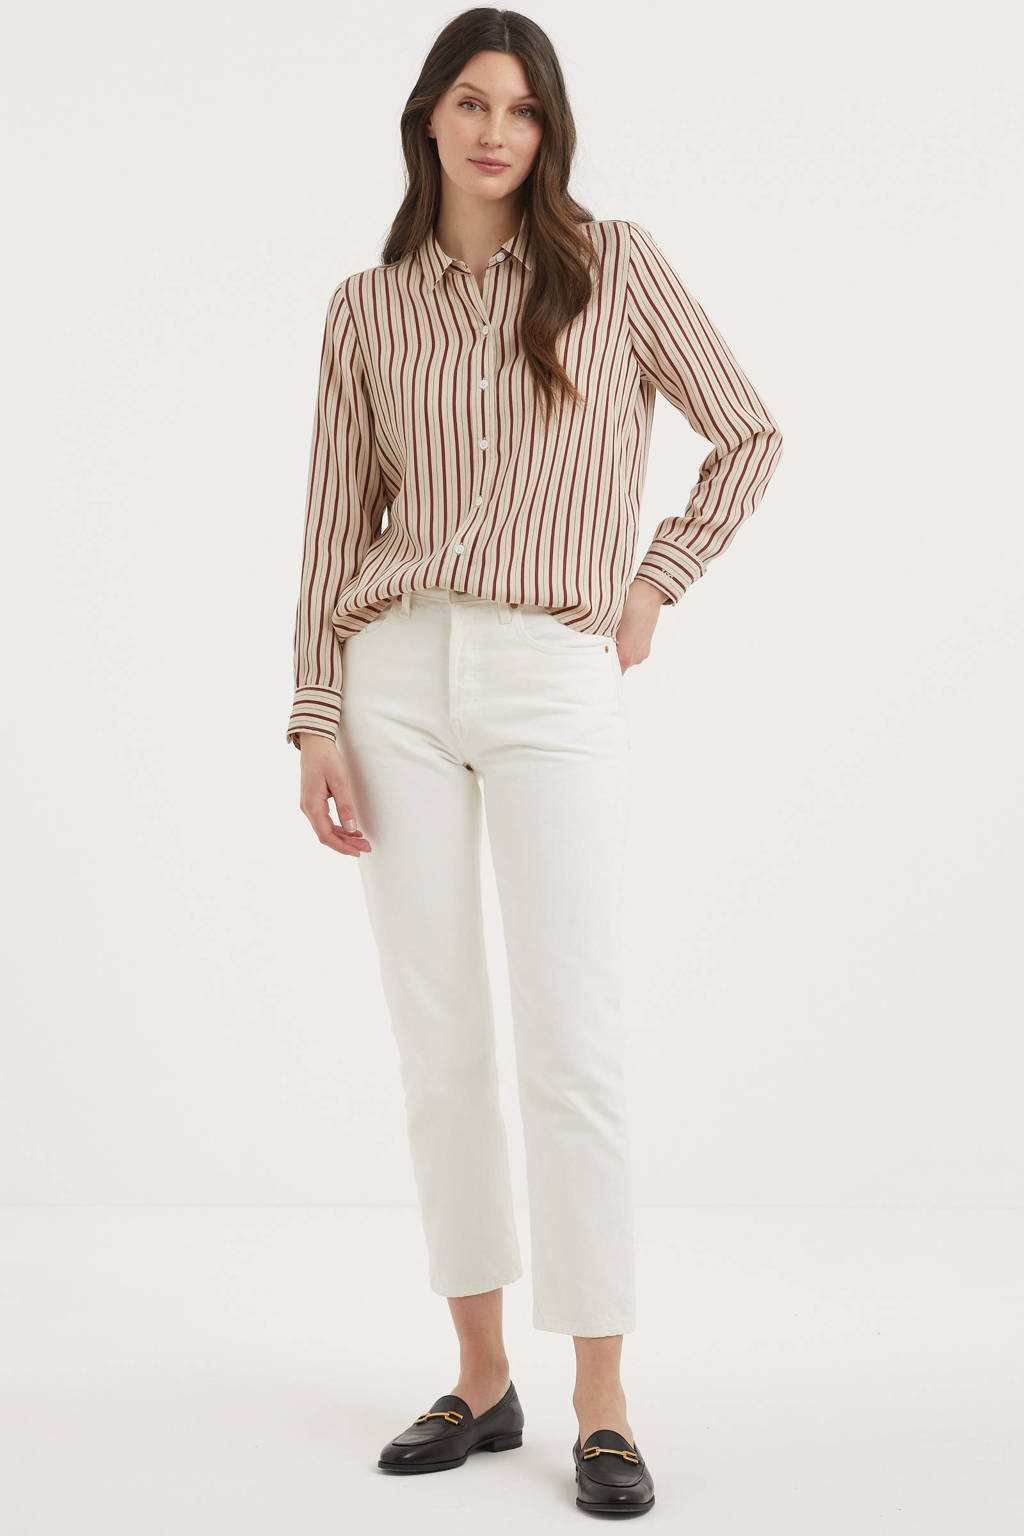 Levi's gestreepte blouse THE CLASSIC SHIRT bruin/rood, Bruin/rood